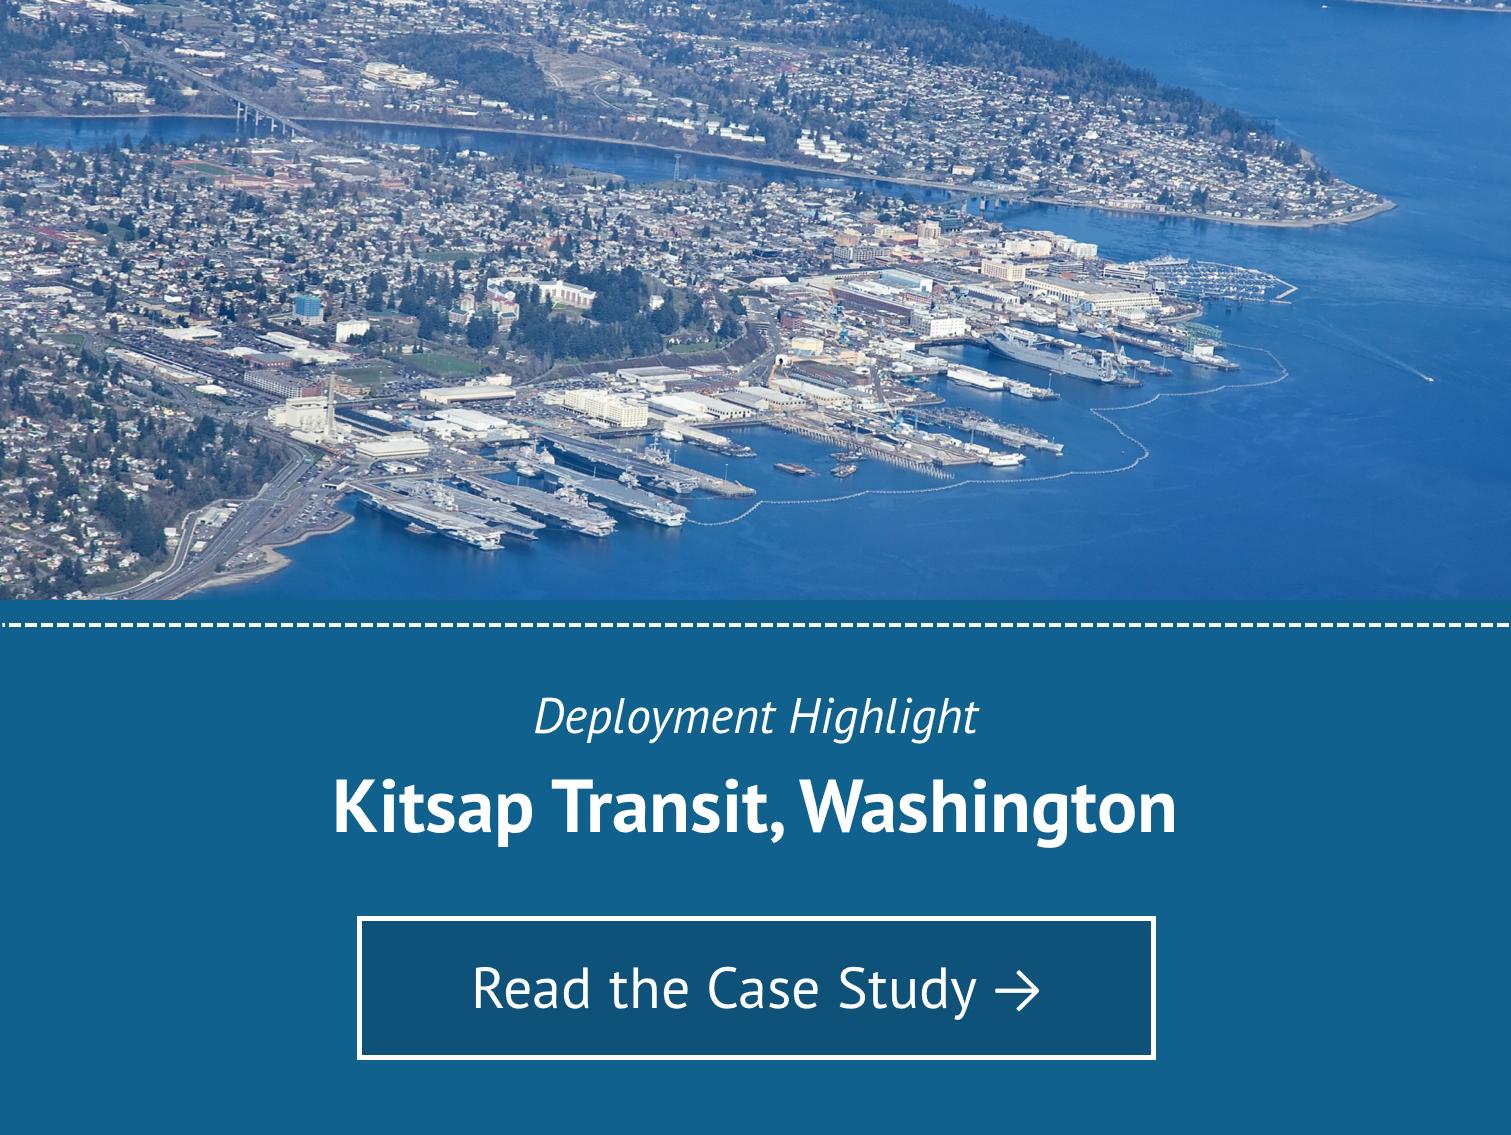 Deployment Highlight for Kitsap Transit Washington - Read the Case Study